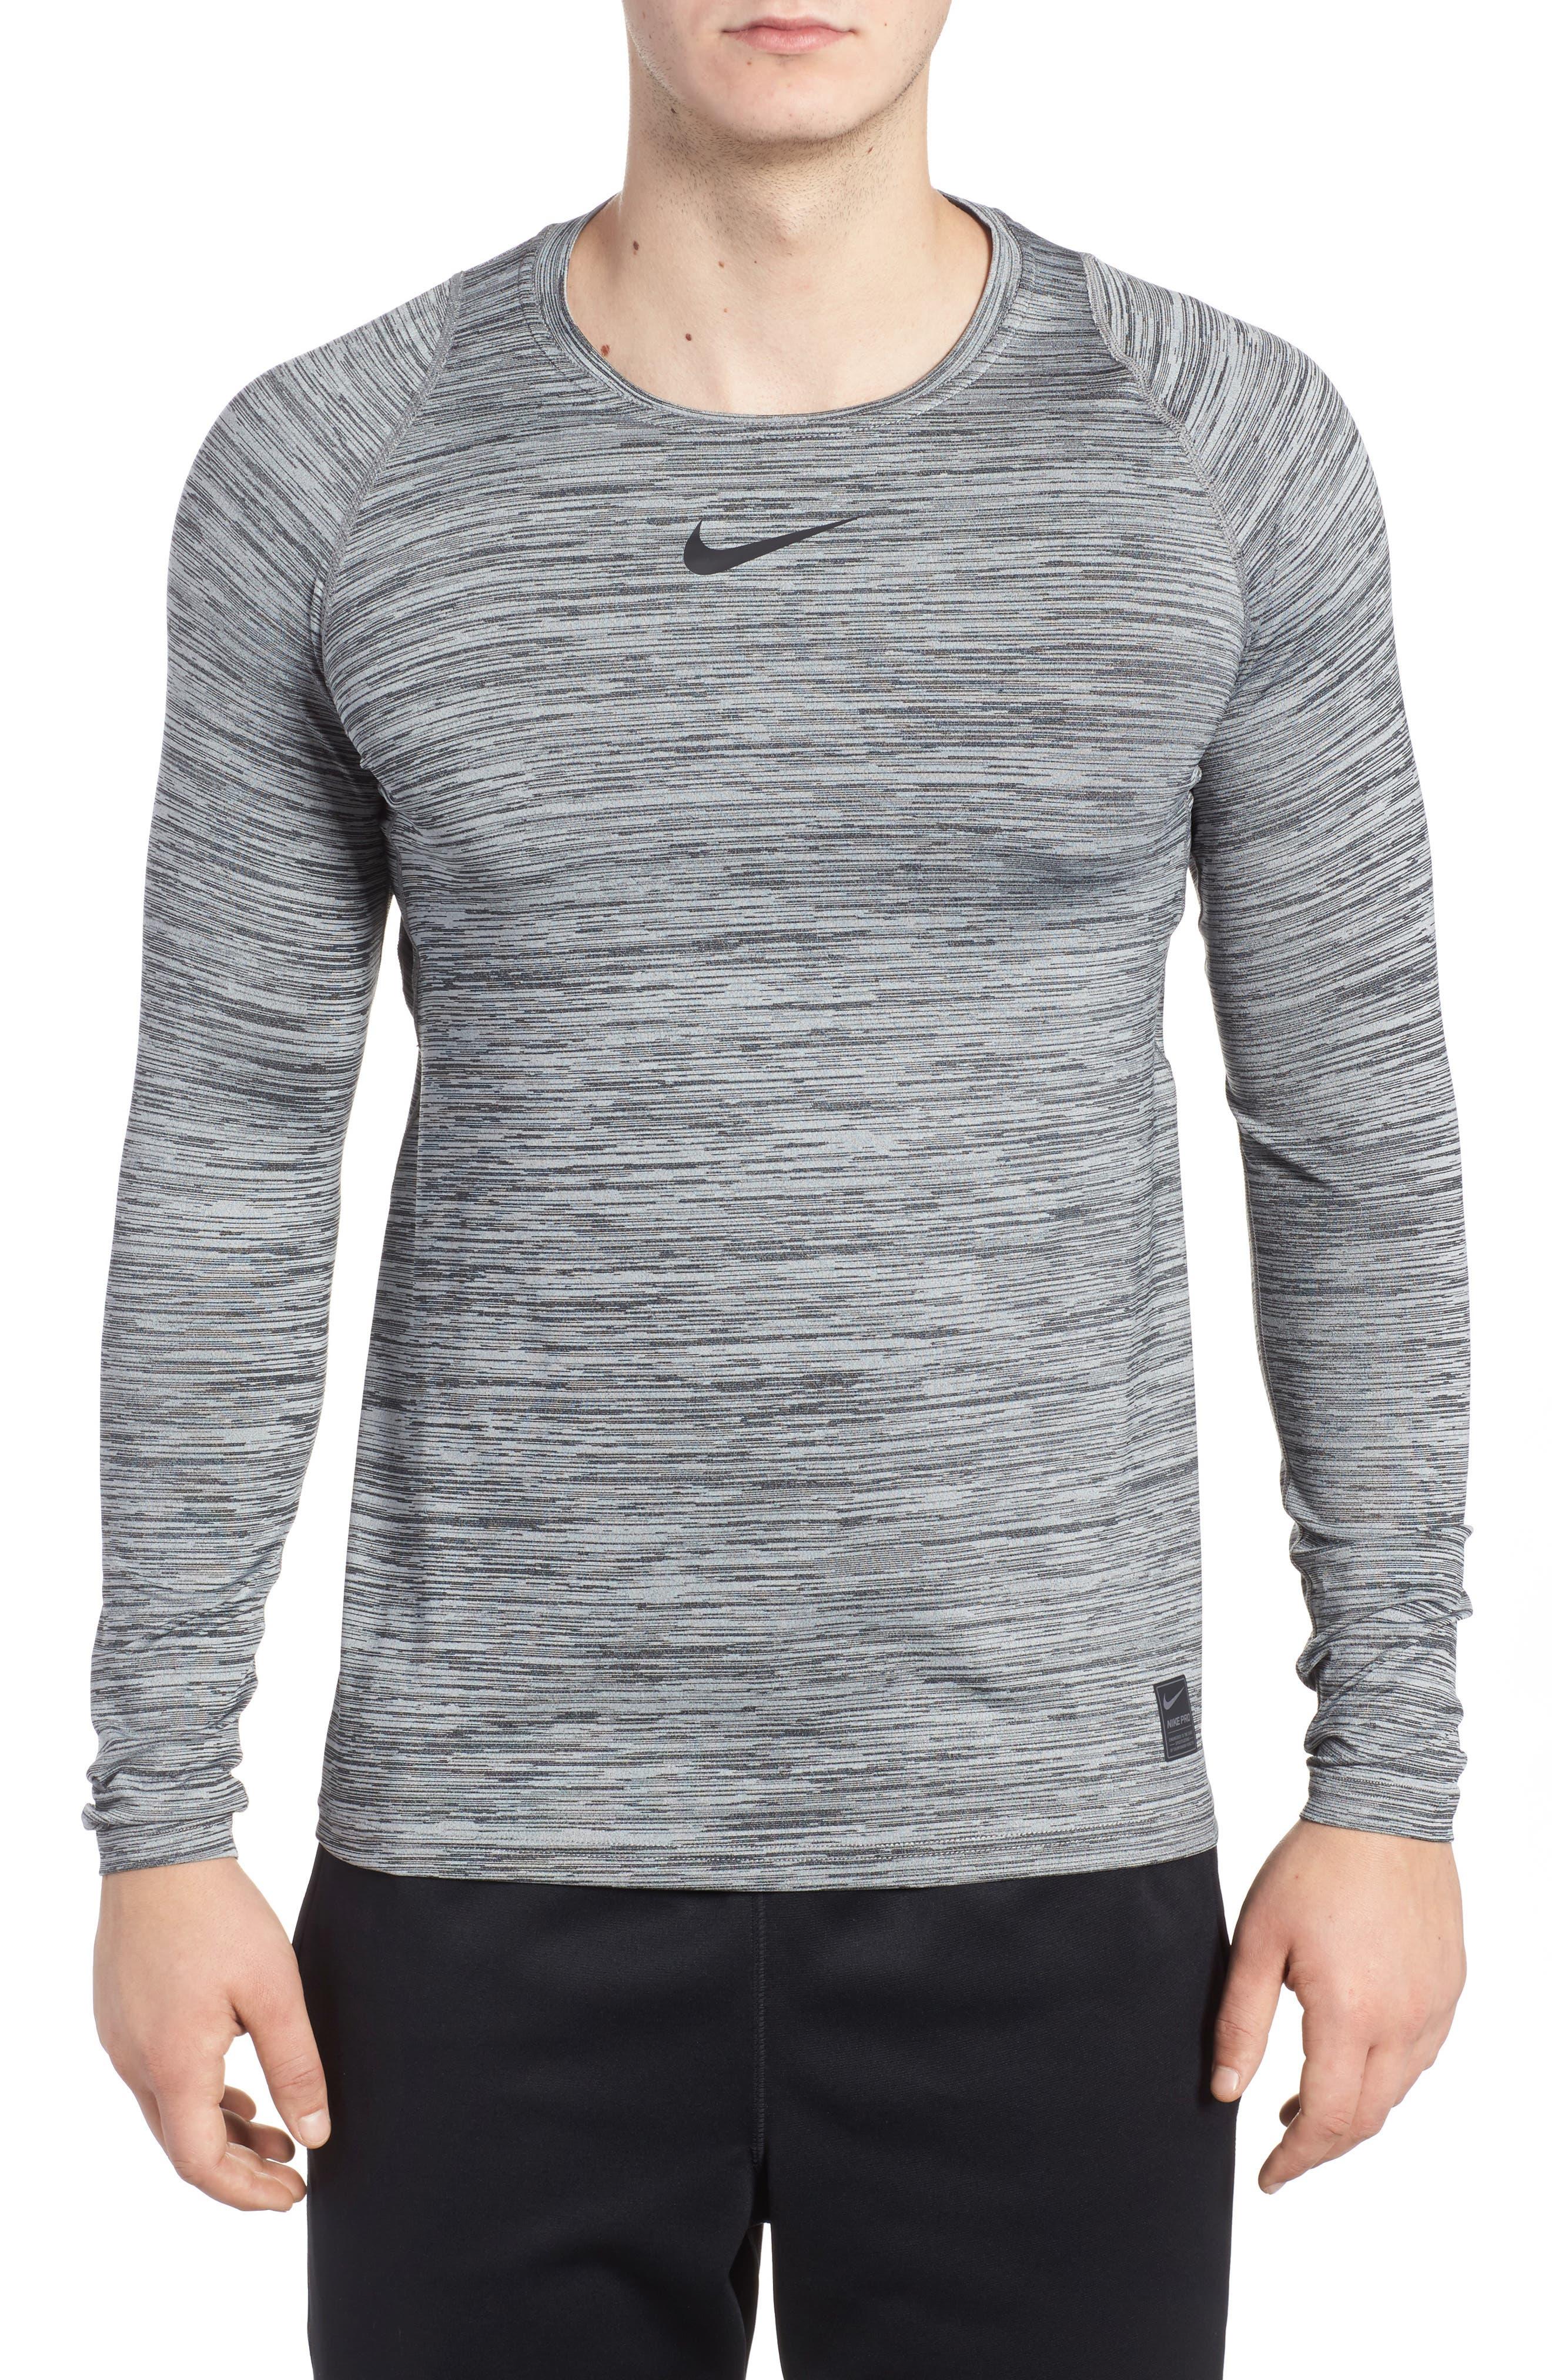 Nike Pro Long Sleeve T-Shirt, Black